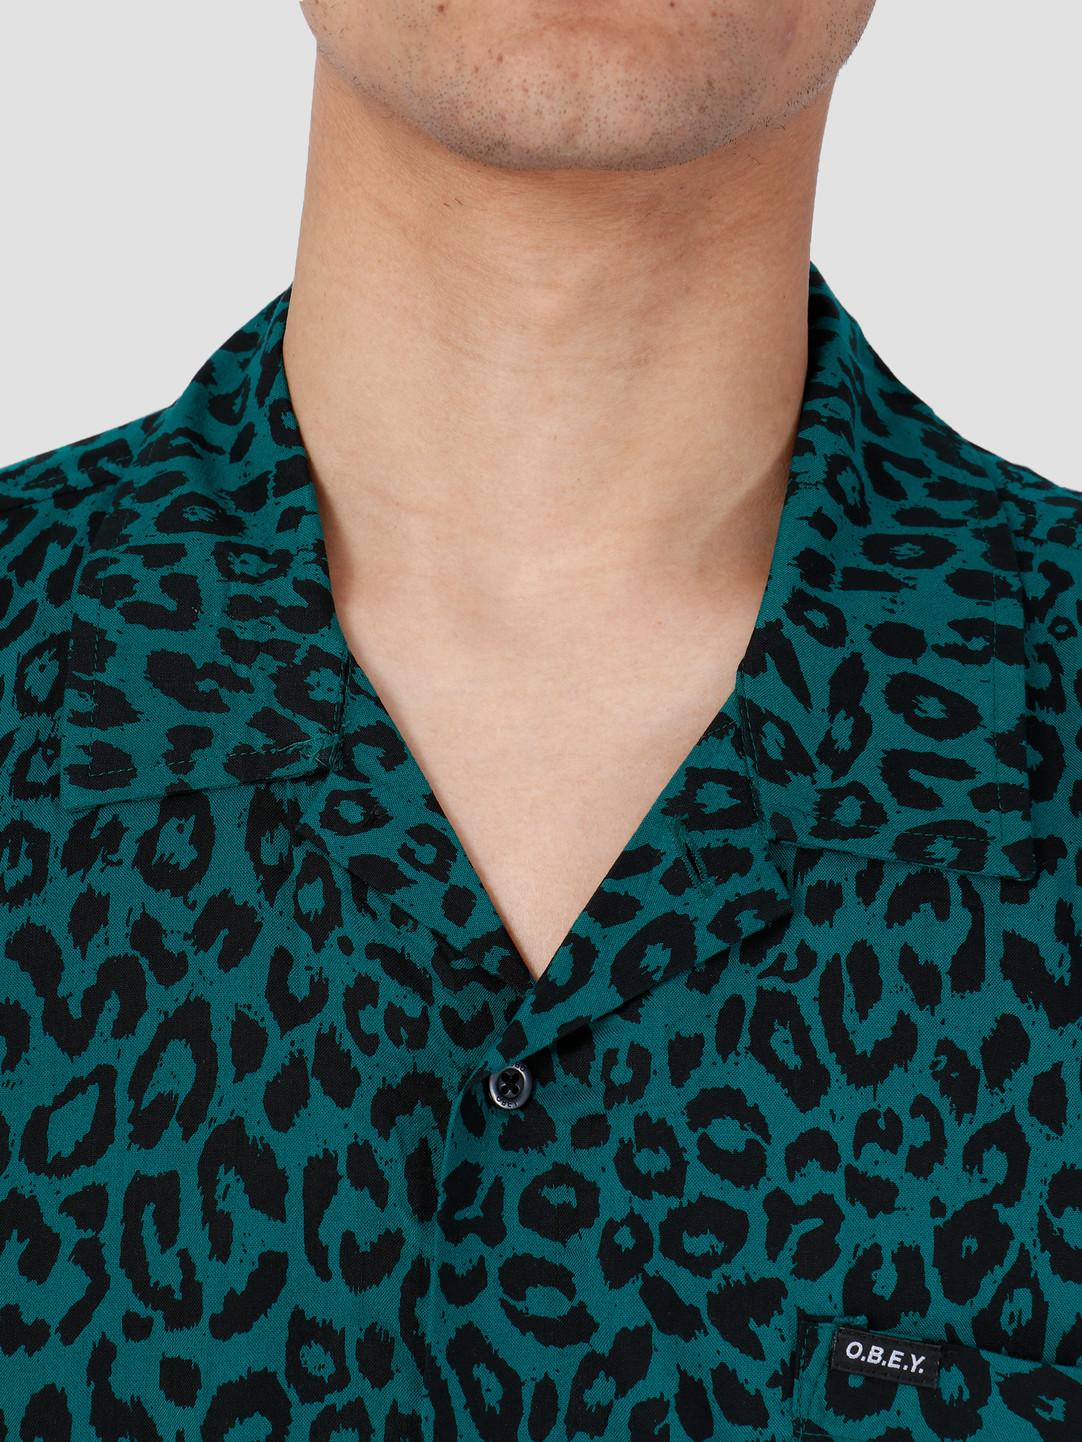 Obey Obey Shortsleeve Woven Blue Green Multi 181210247-GMU